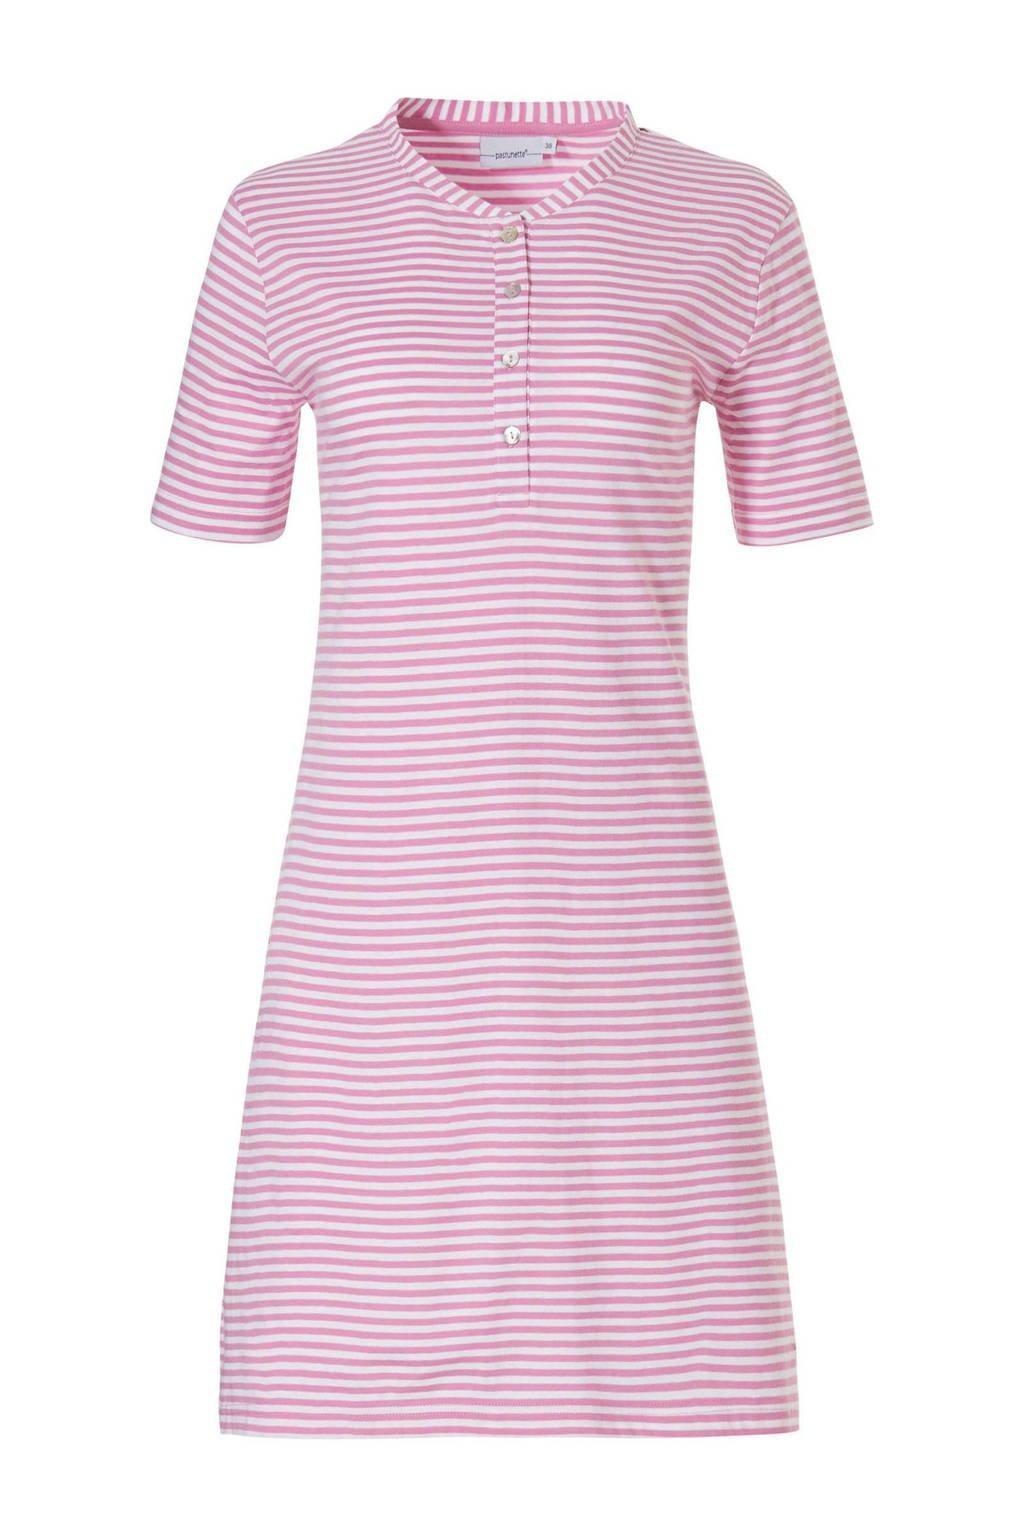 Pastunette gestreept nachthemd roze/wit, Roze/wit